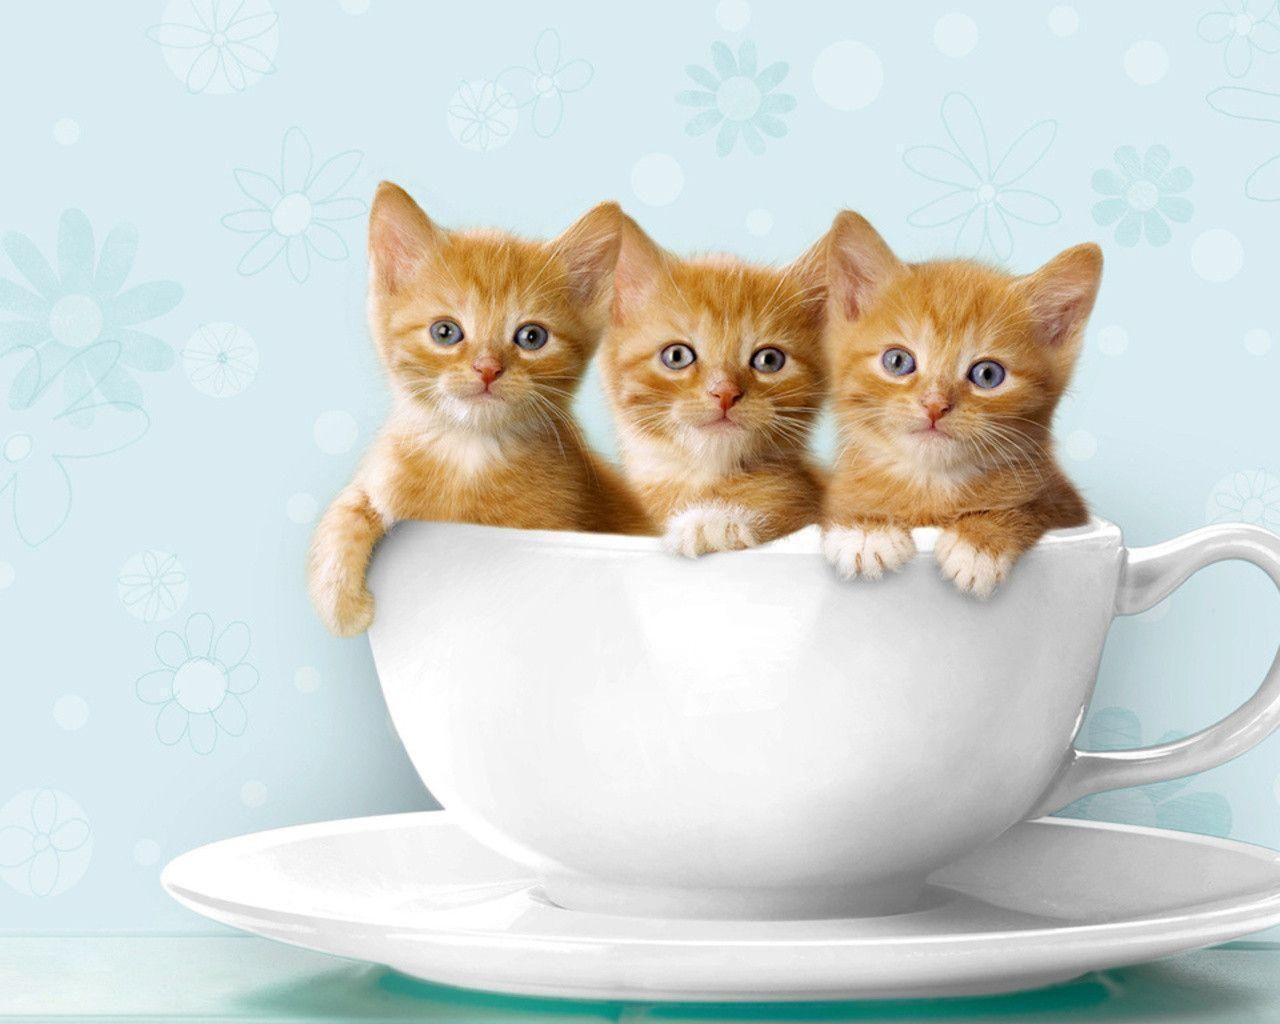 Cute Cats Wallpapers Wallpaper Cave Teacup Kitten Kitten Wallpaper Cute Cats